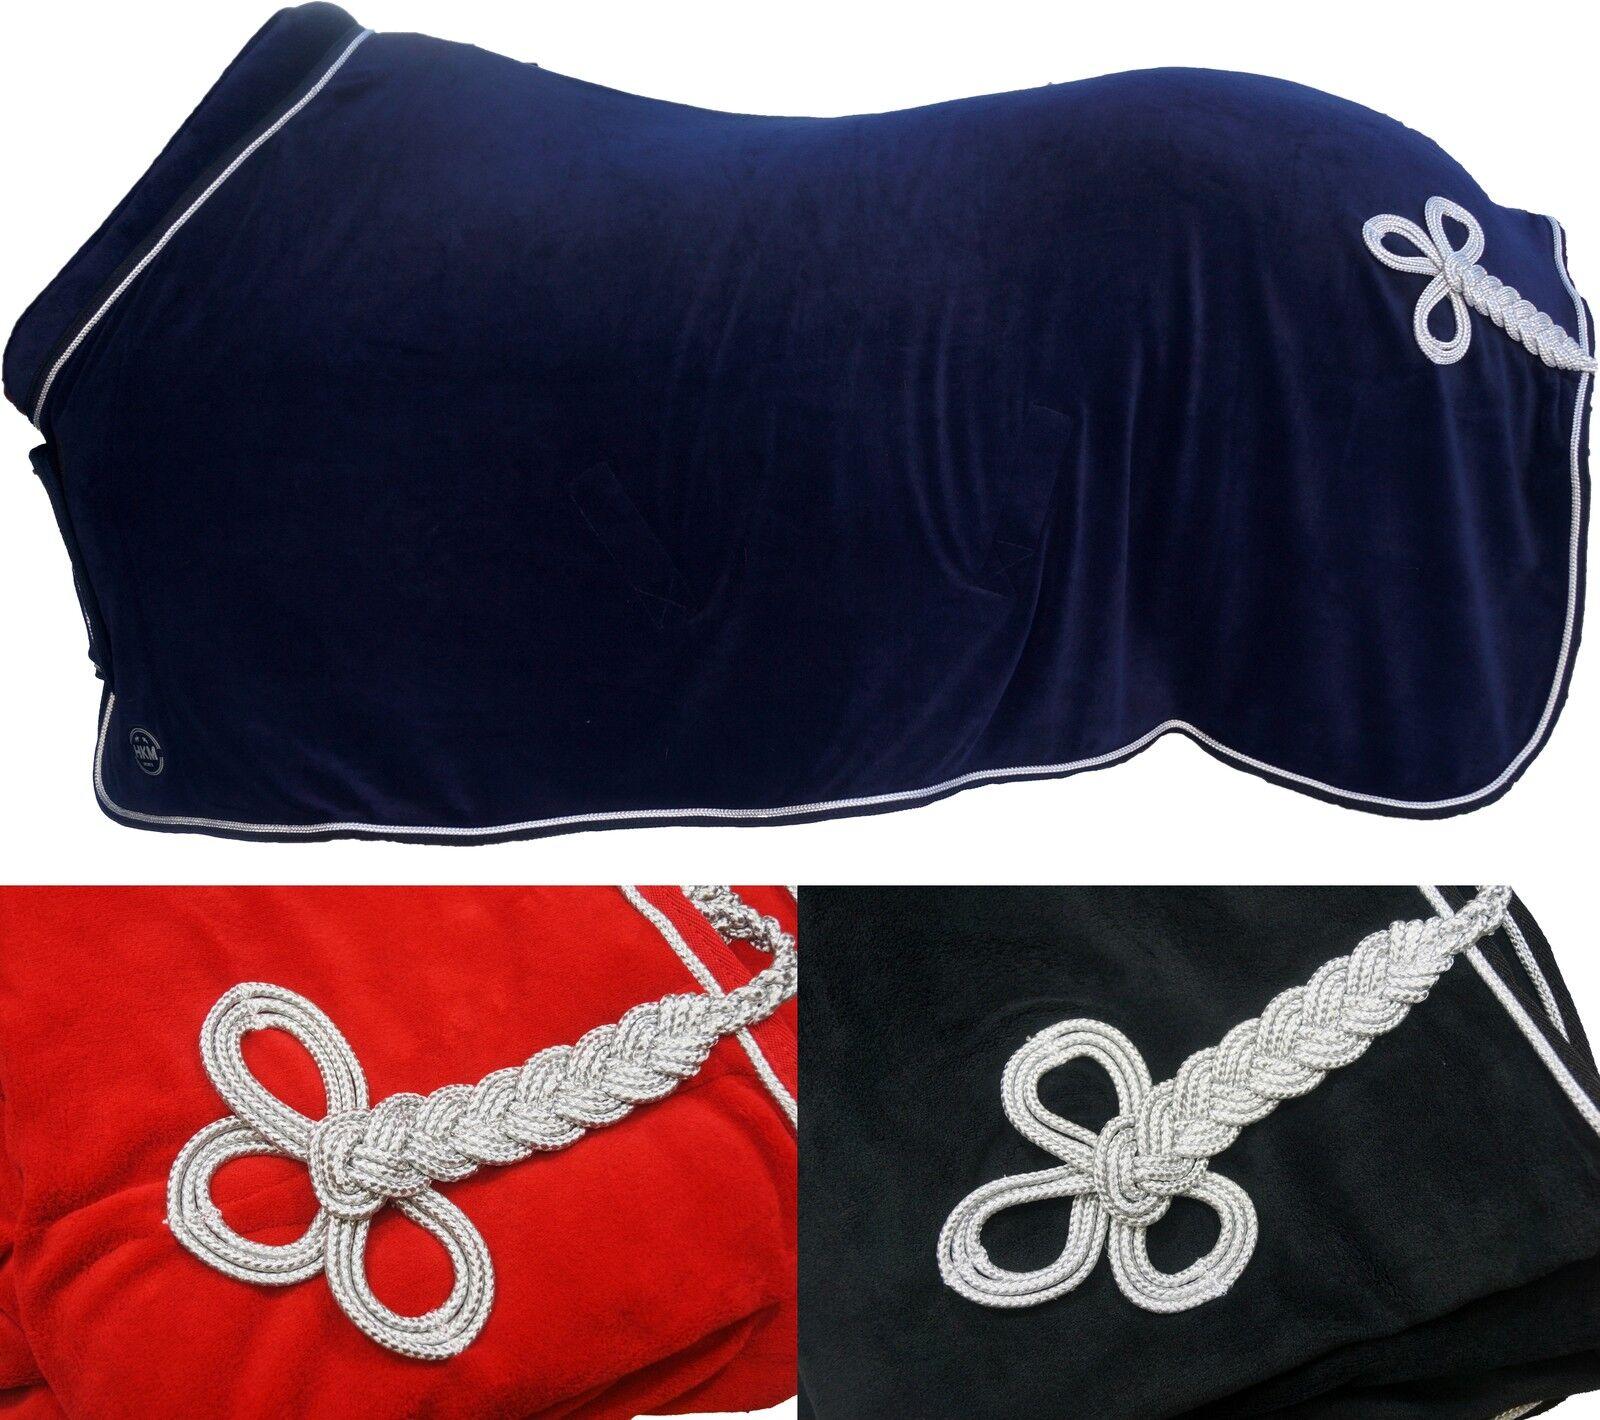 % % % HKM Anti-sweat Sheet Parade Blanket Show Dark bluee 155cm (7224) % % %